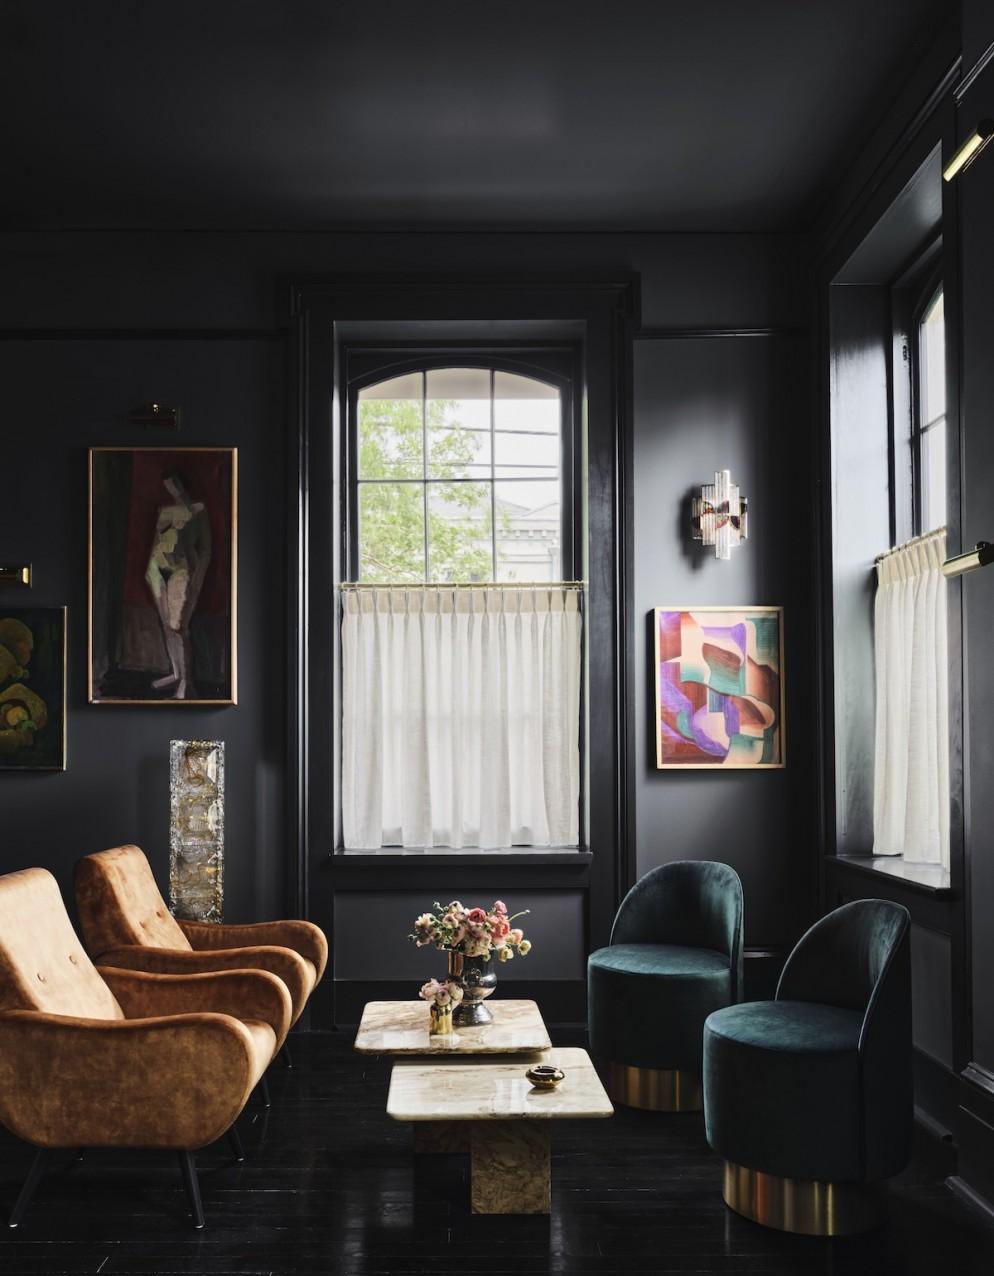 Hotel Saint Vincent -  Chapel Club x Seating Area - by Douglas Friedman